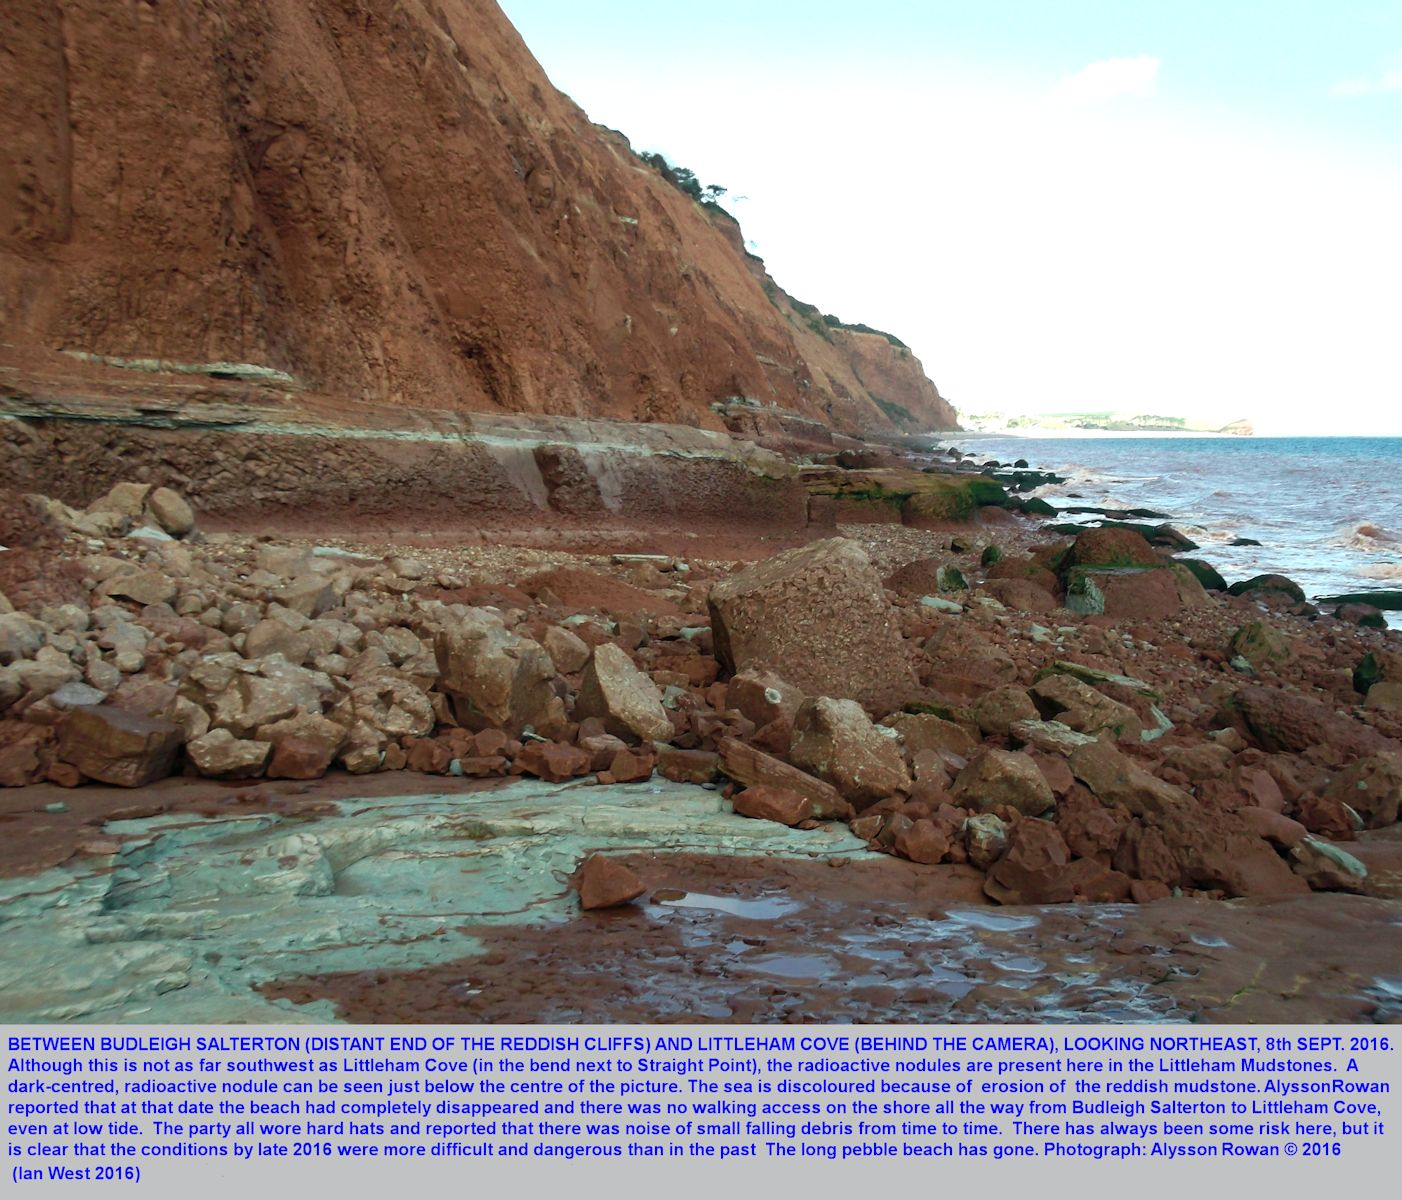 Eroding cliffs of Littleham Mudstone, with radioactive nodules, about half-way between Budleigh Salterton and Littleham Cove, Devon, photograph by Alysson Rowan